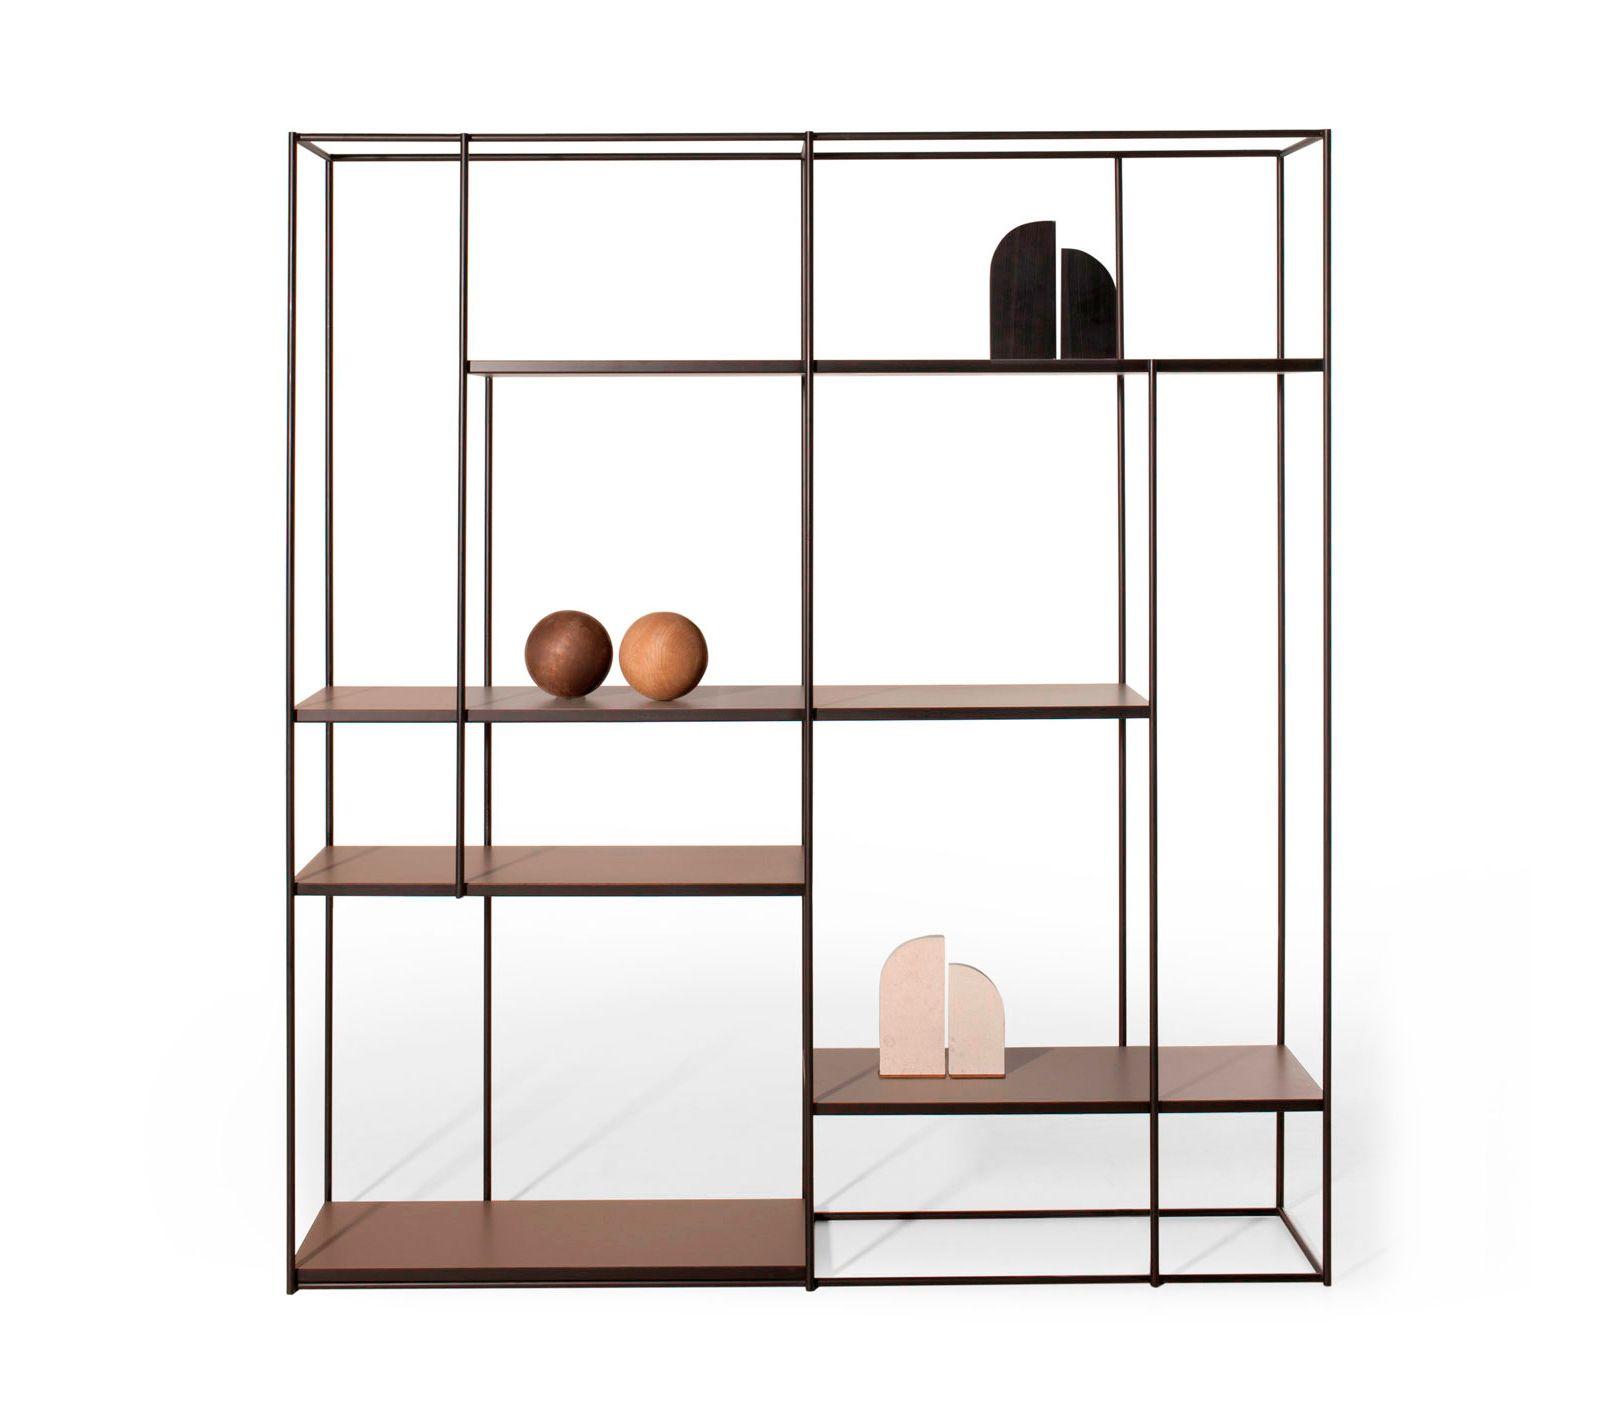 Hill ivano redaelli sala pinterest shelves shelving and